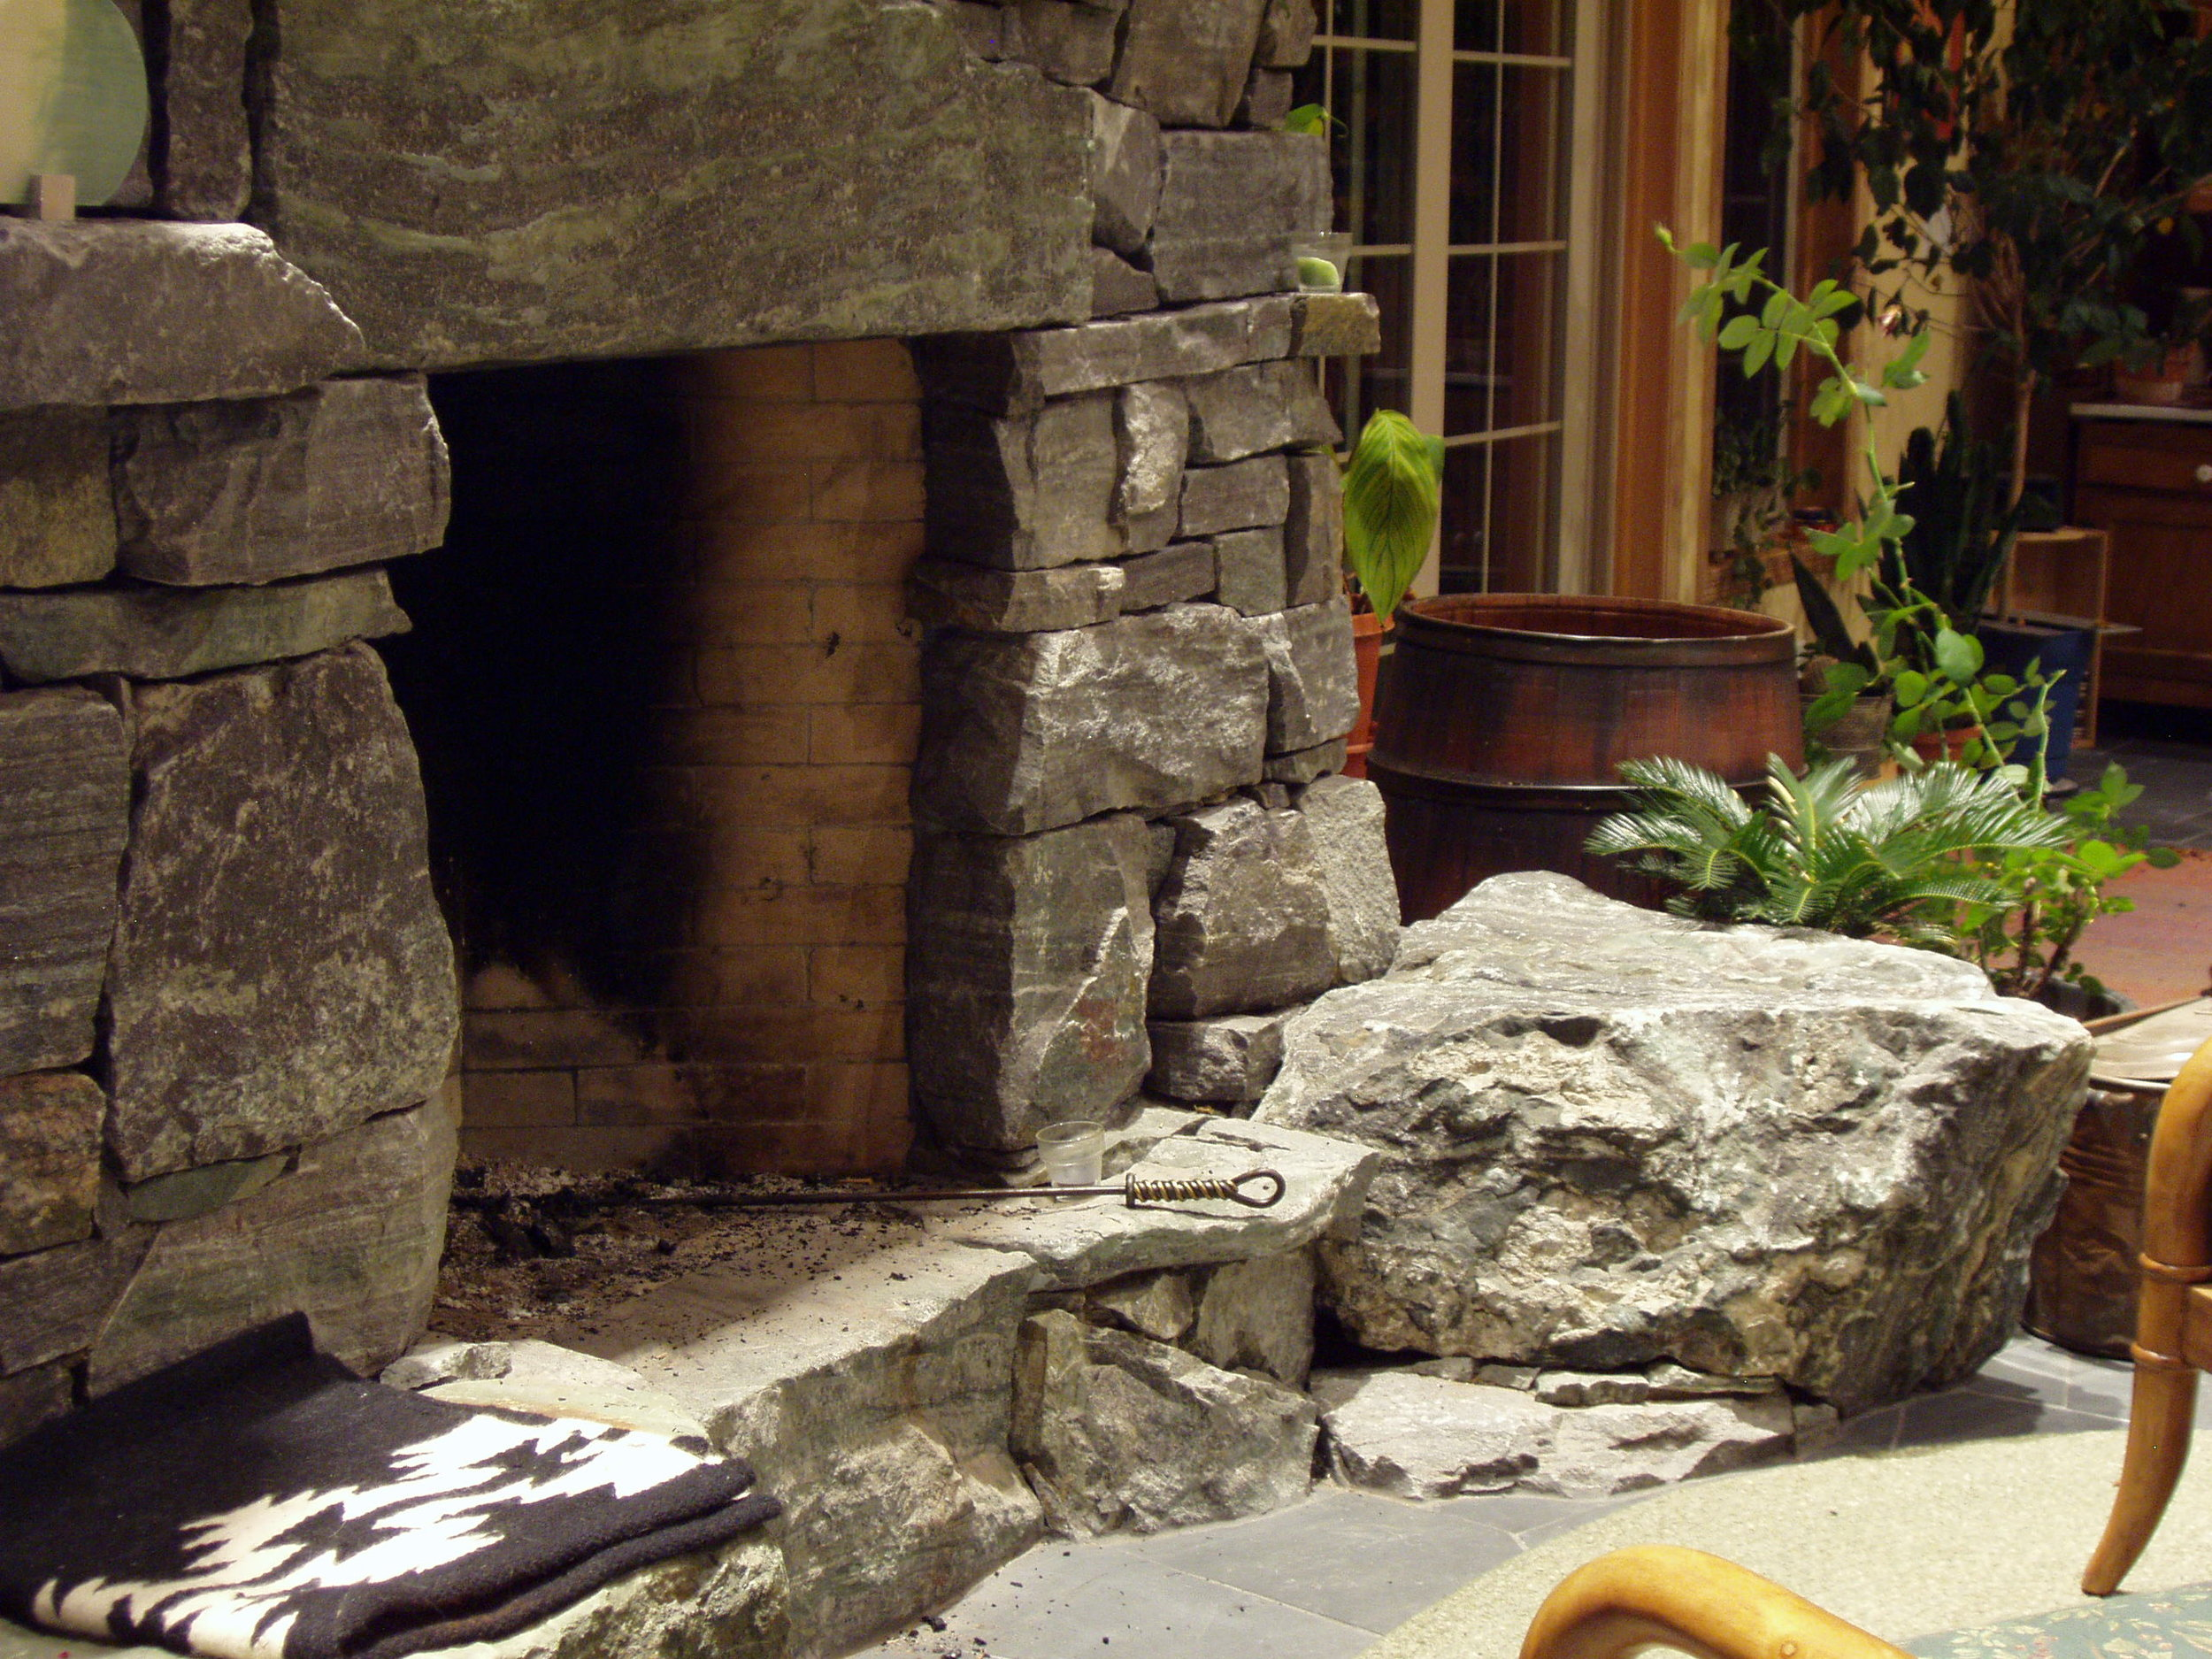 klapmeir-dougherty fireplaces 019.jpg